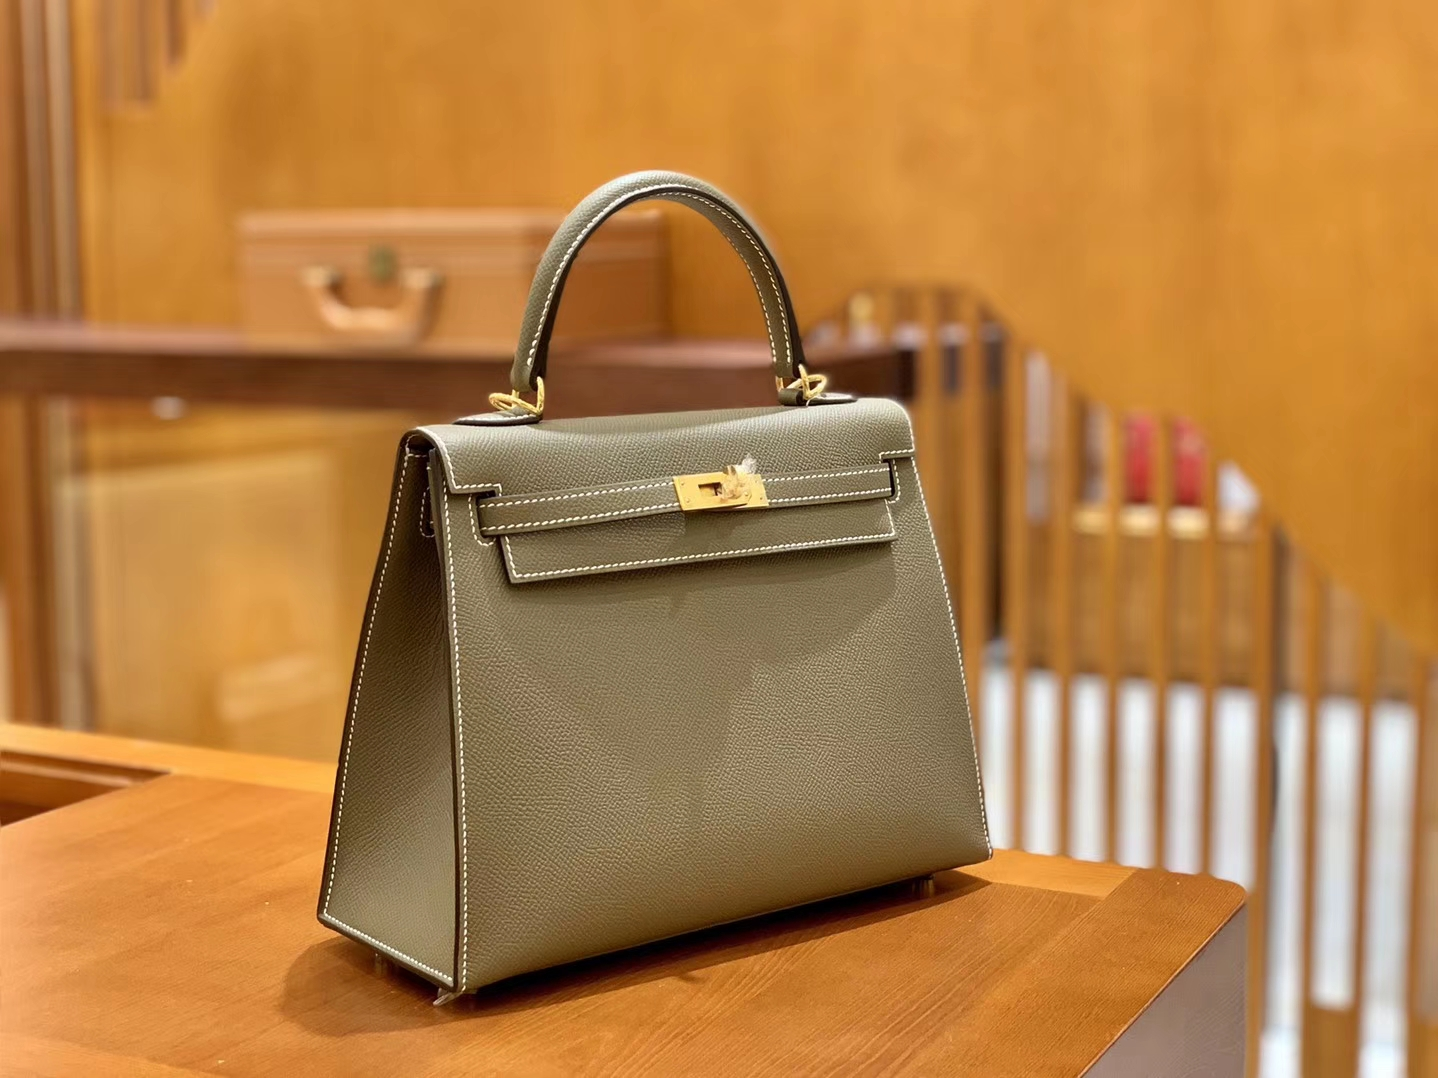 Hermès(爱马仕)Kelly 28cm 大象灰 金扣 Epsom掌纹牛皮 全手工缝制 臻品级别